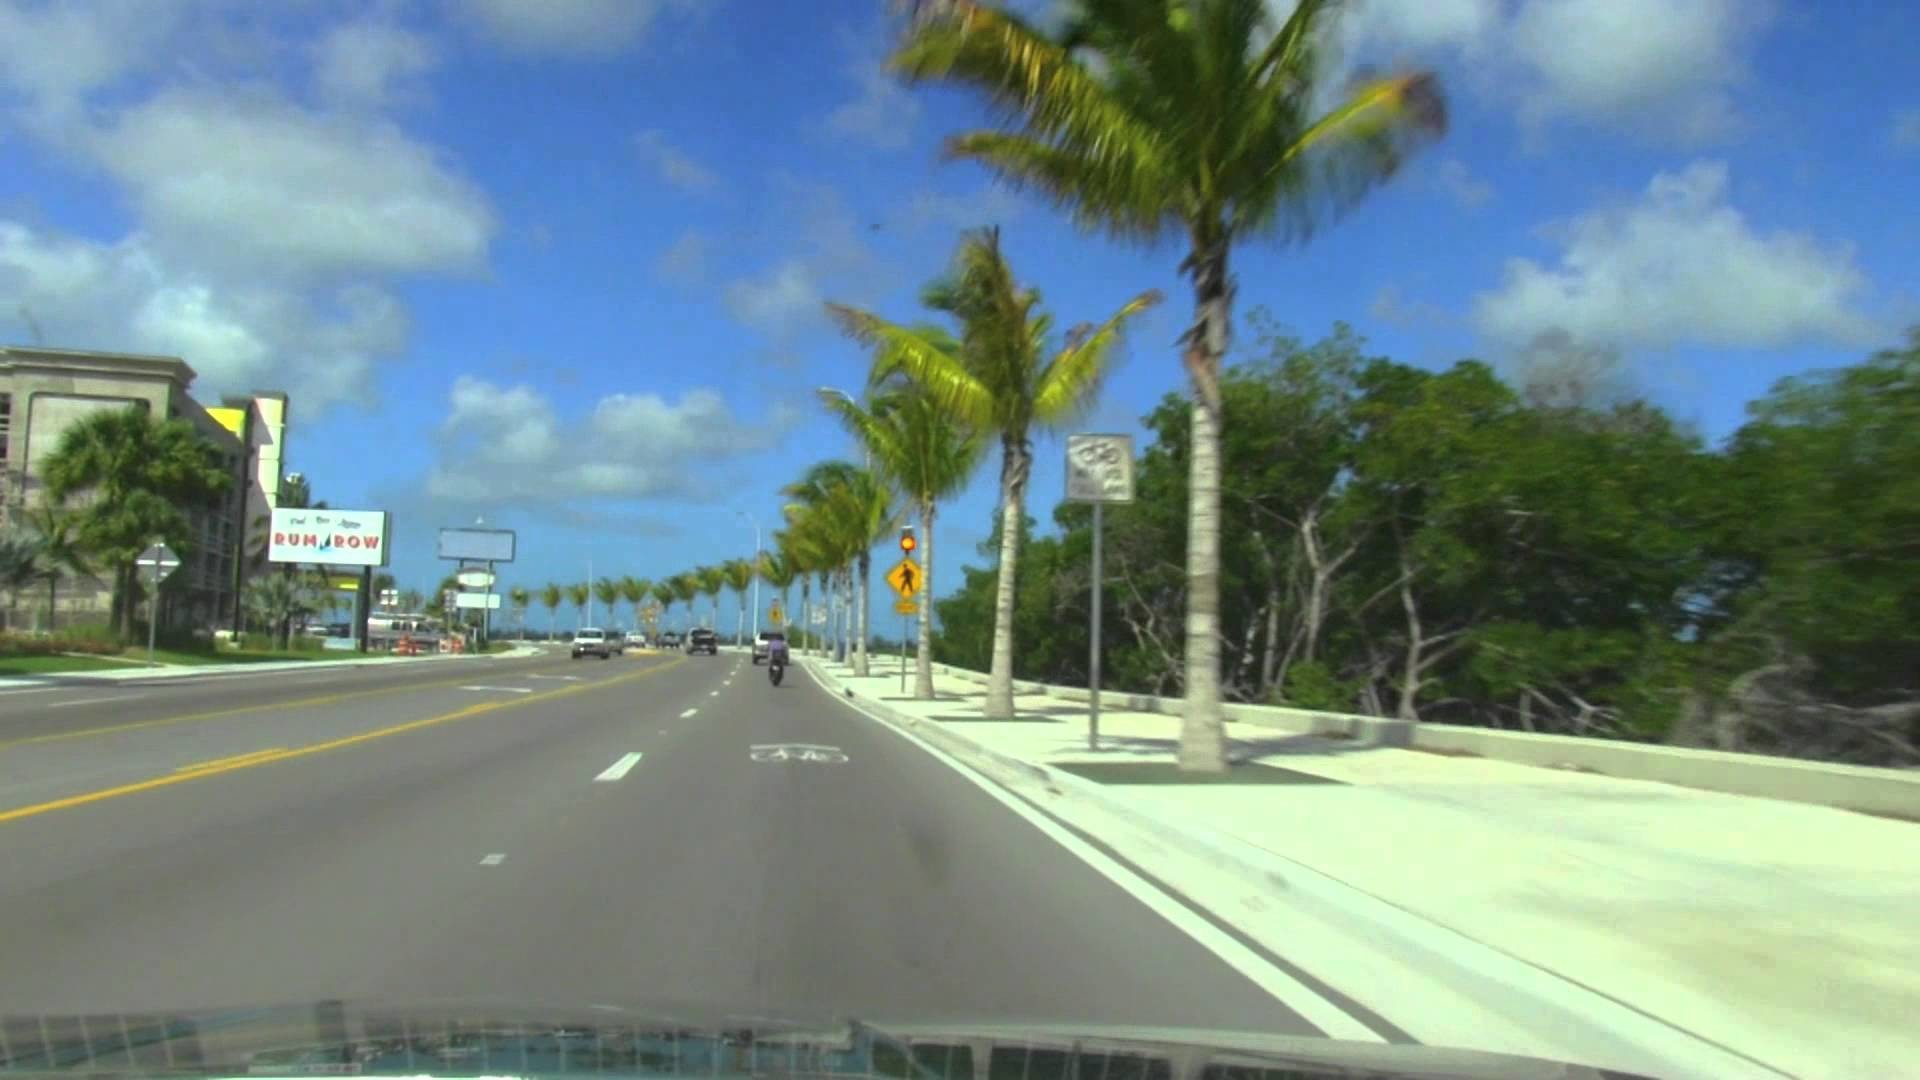 CRUIZIN' FLORIDAS' SCENIC HIGHWAY 1 * THE FLORIDA KEYS * MARCH 2015 * 1080p  – YouTube